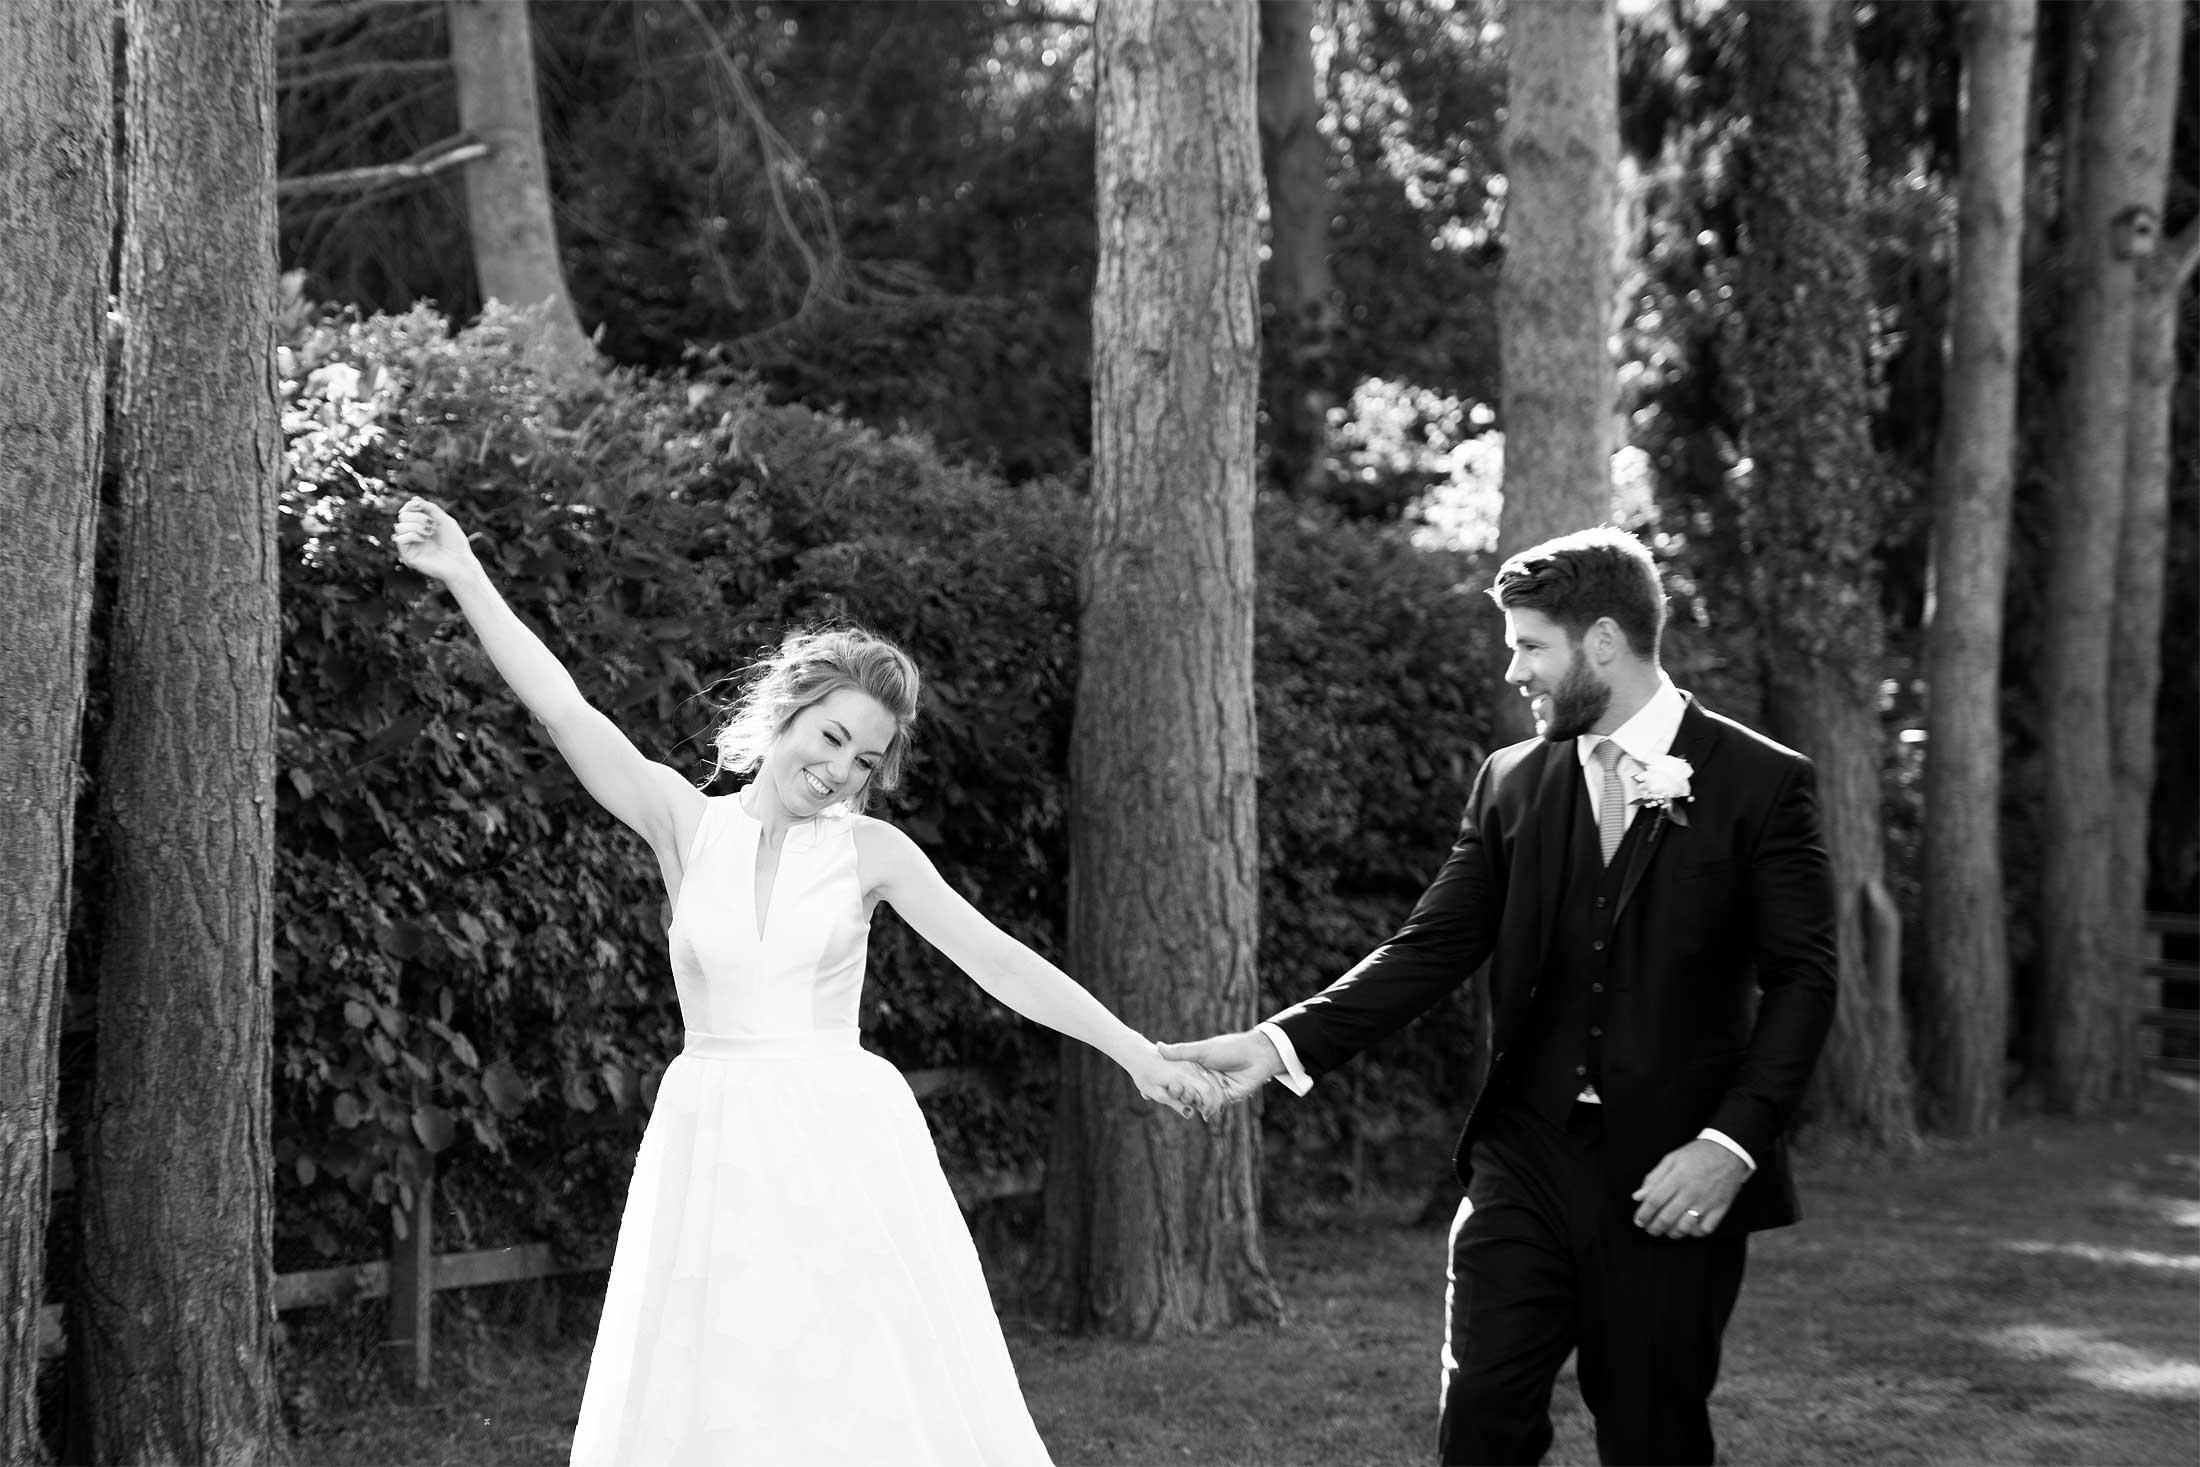 R&B_Wed1089_norfolk_wedding.jpg